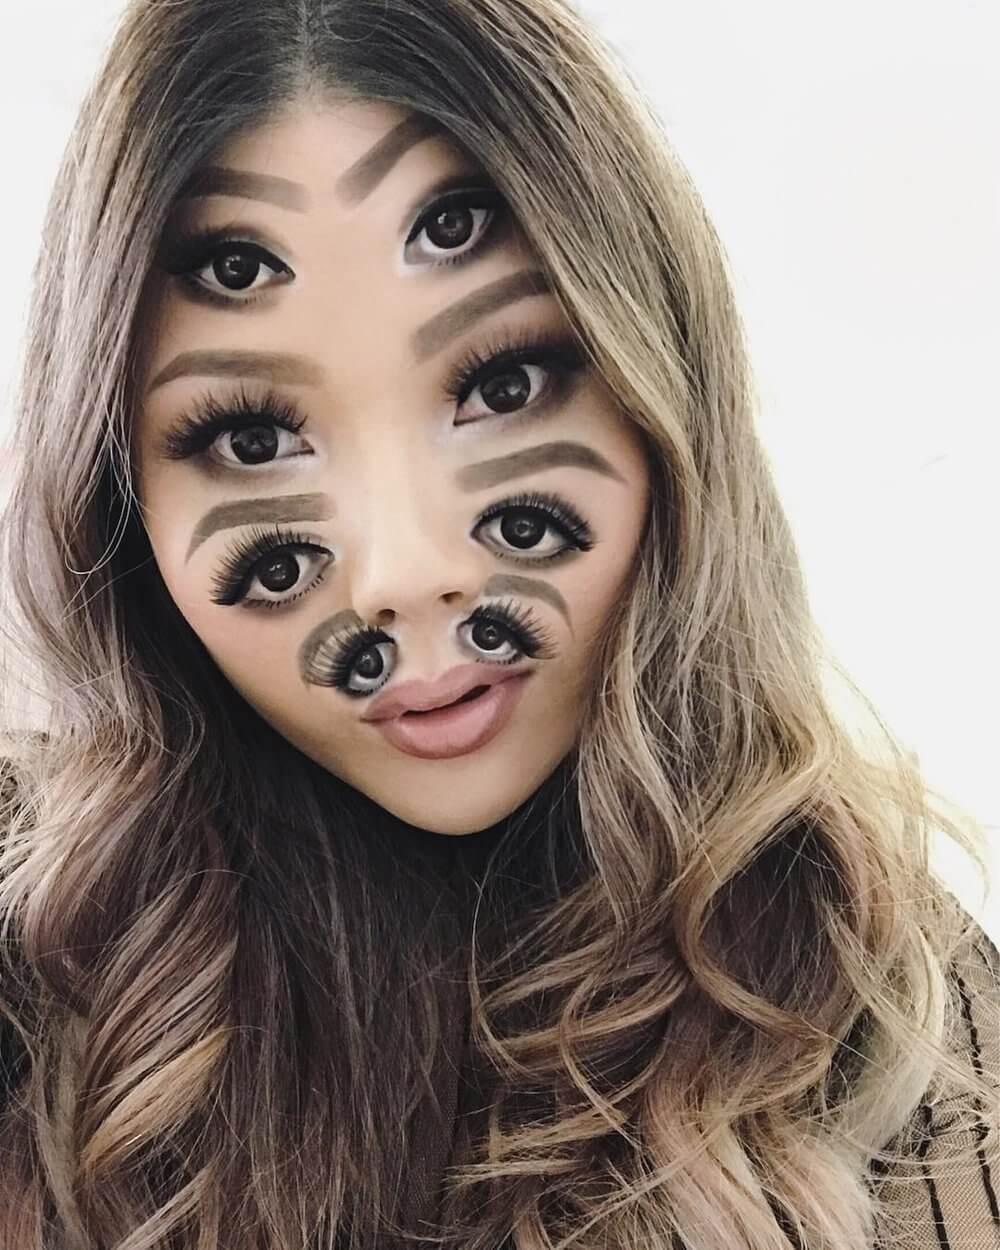 mimi choi makeup portraits 19 (1)